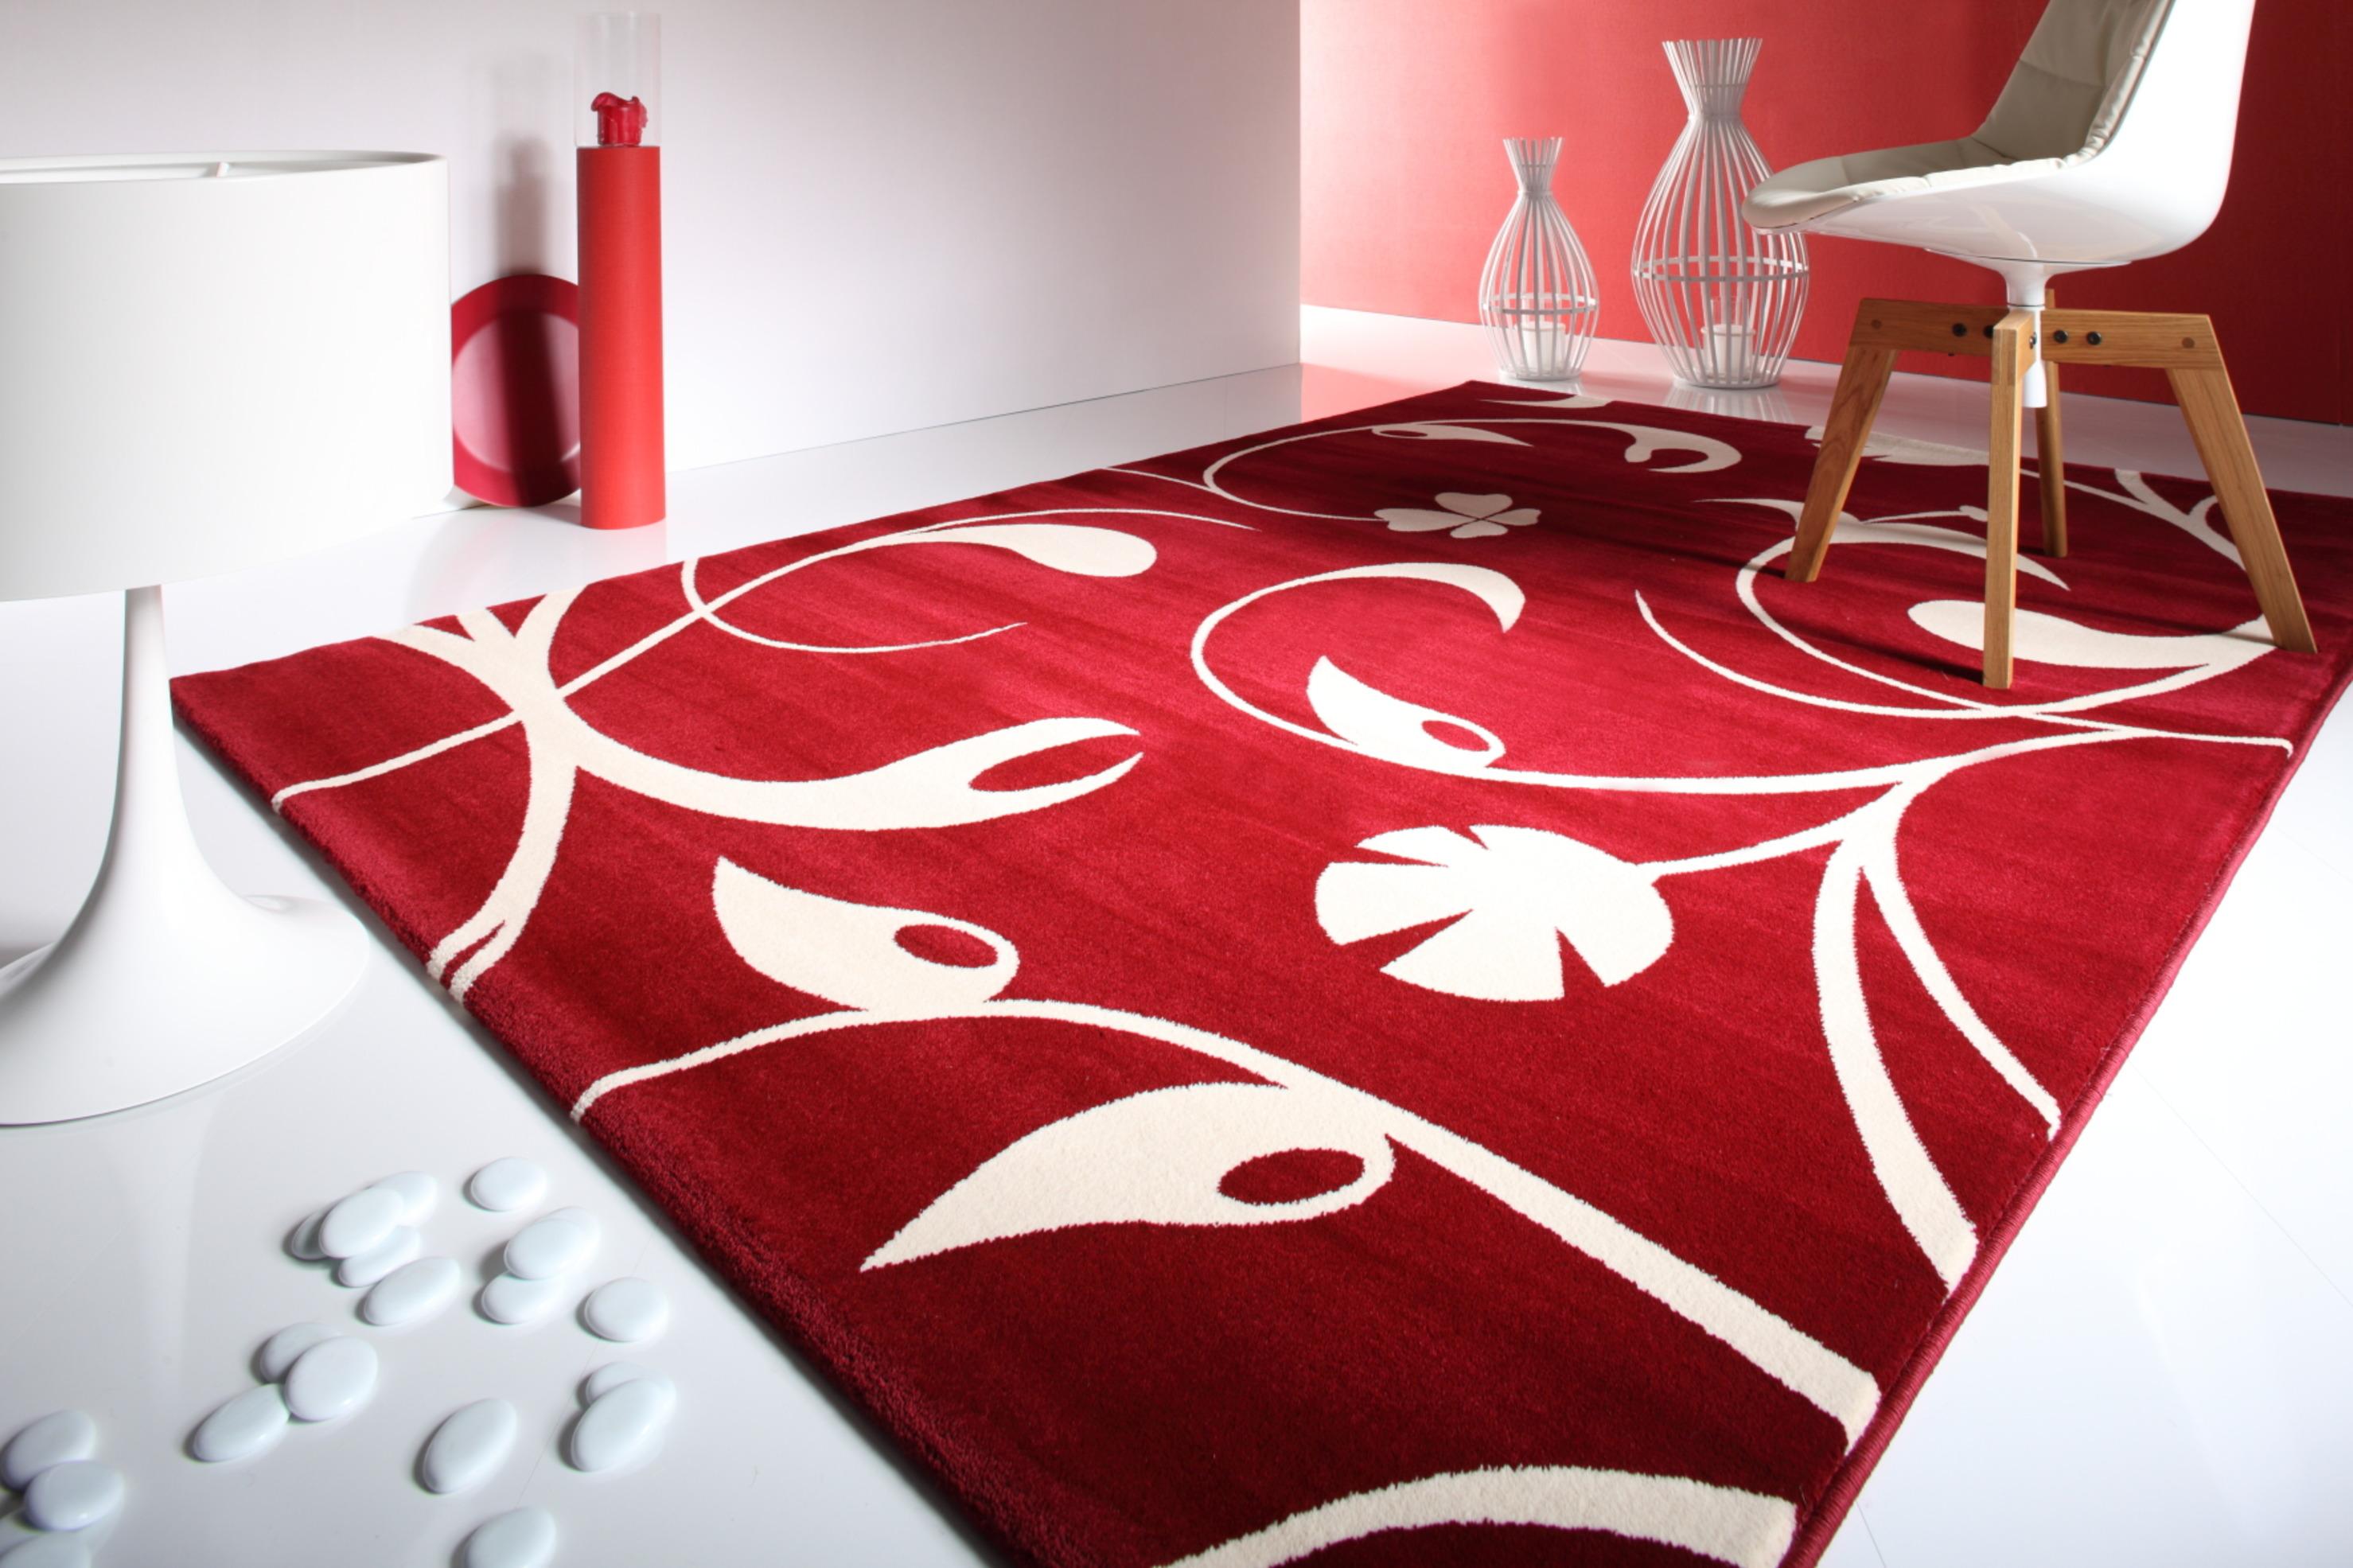 Designer-Golze-Teppich-carpet-floral-Astra-Jardin_1314_1971_006400_aa812